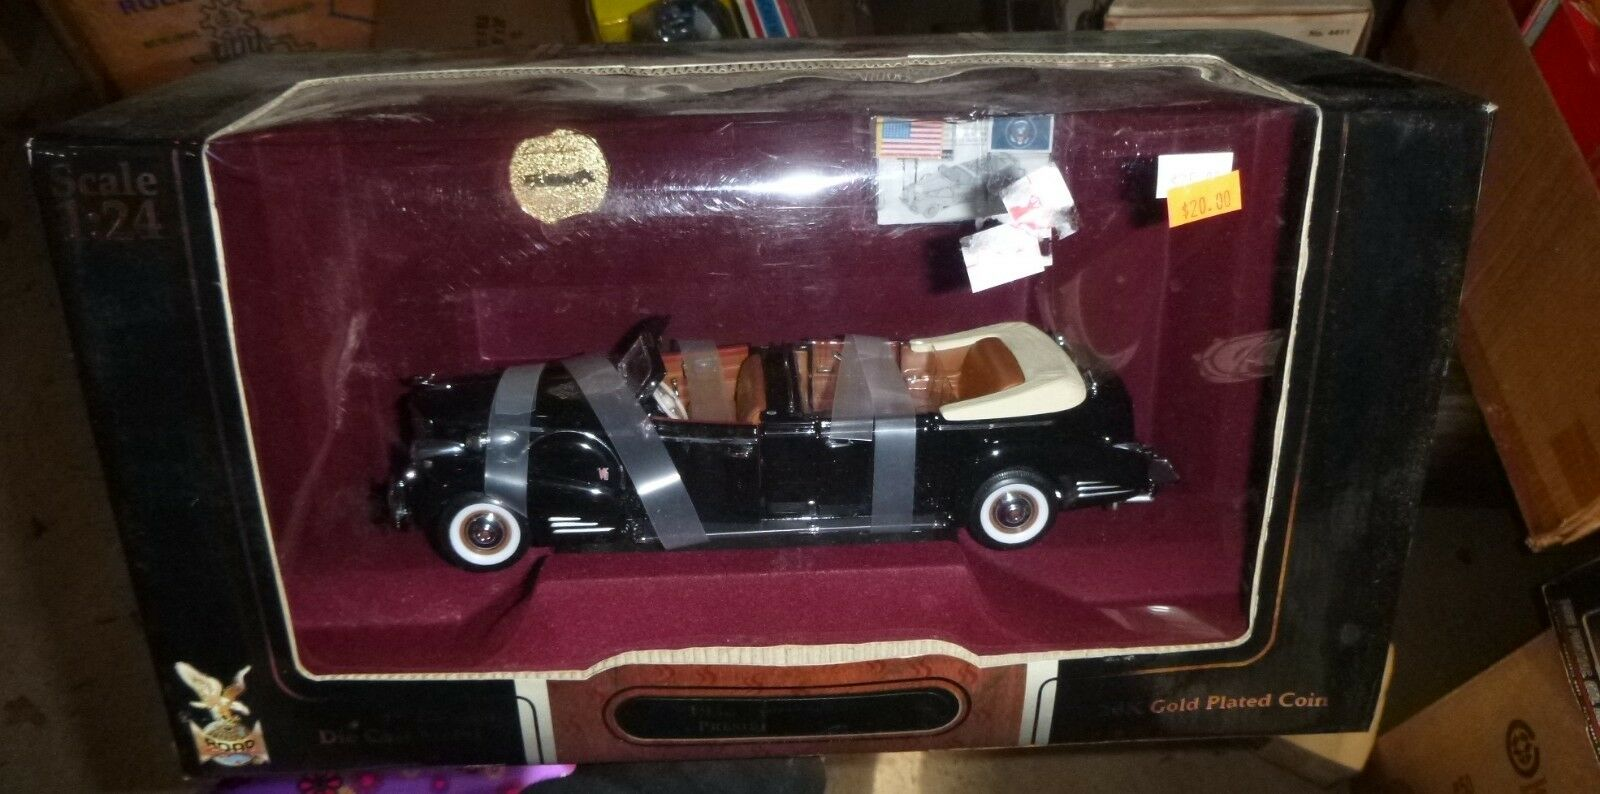 ROAD SIGNATURE 1938 CADILLAC V-16 PRESIDENTIAL LIMO VINTAGE CAR 1 24 DIECAST